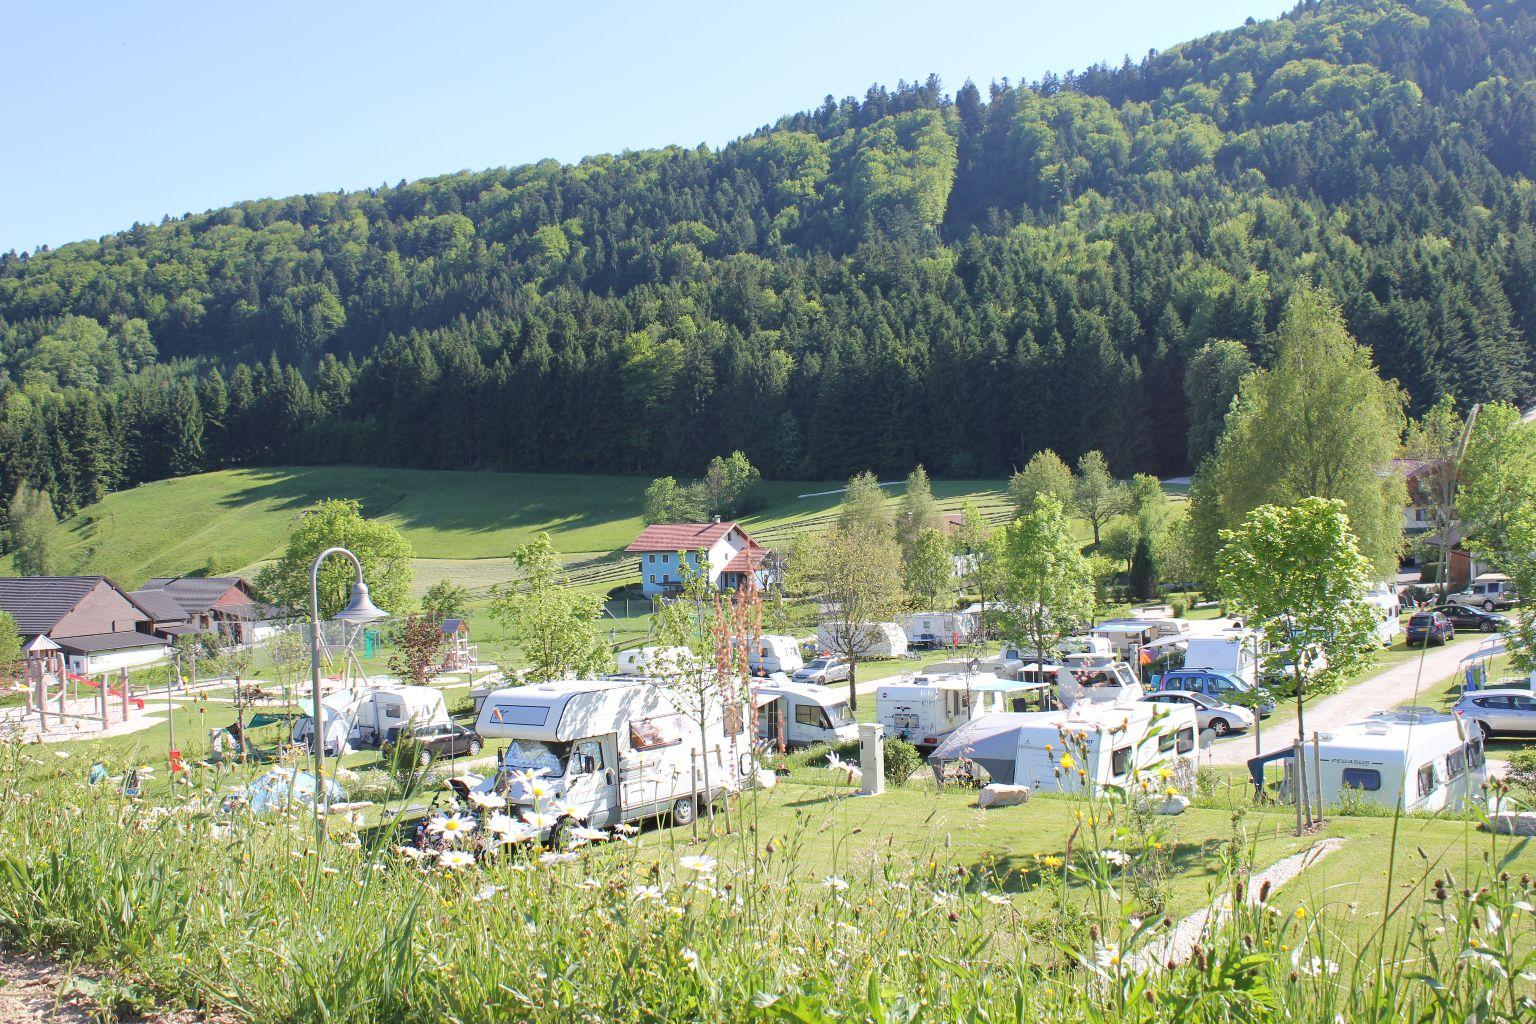 Location: Camp MondSeeLand